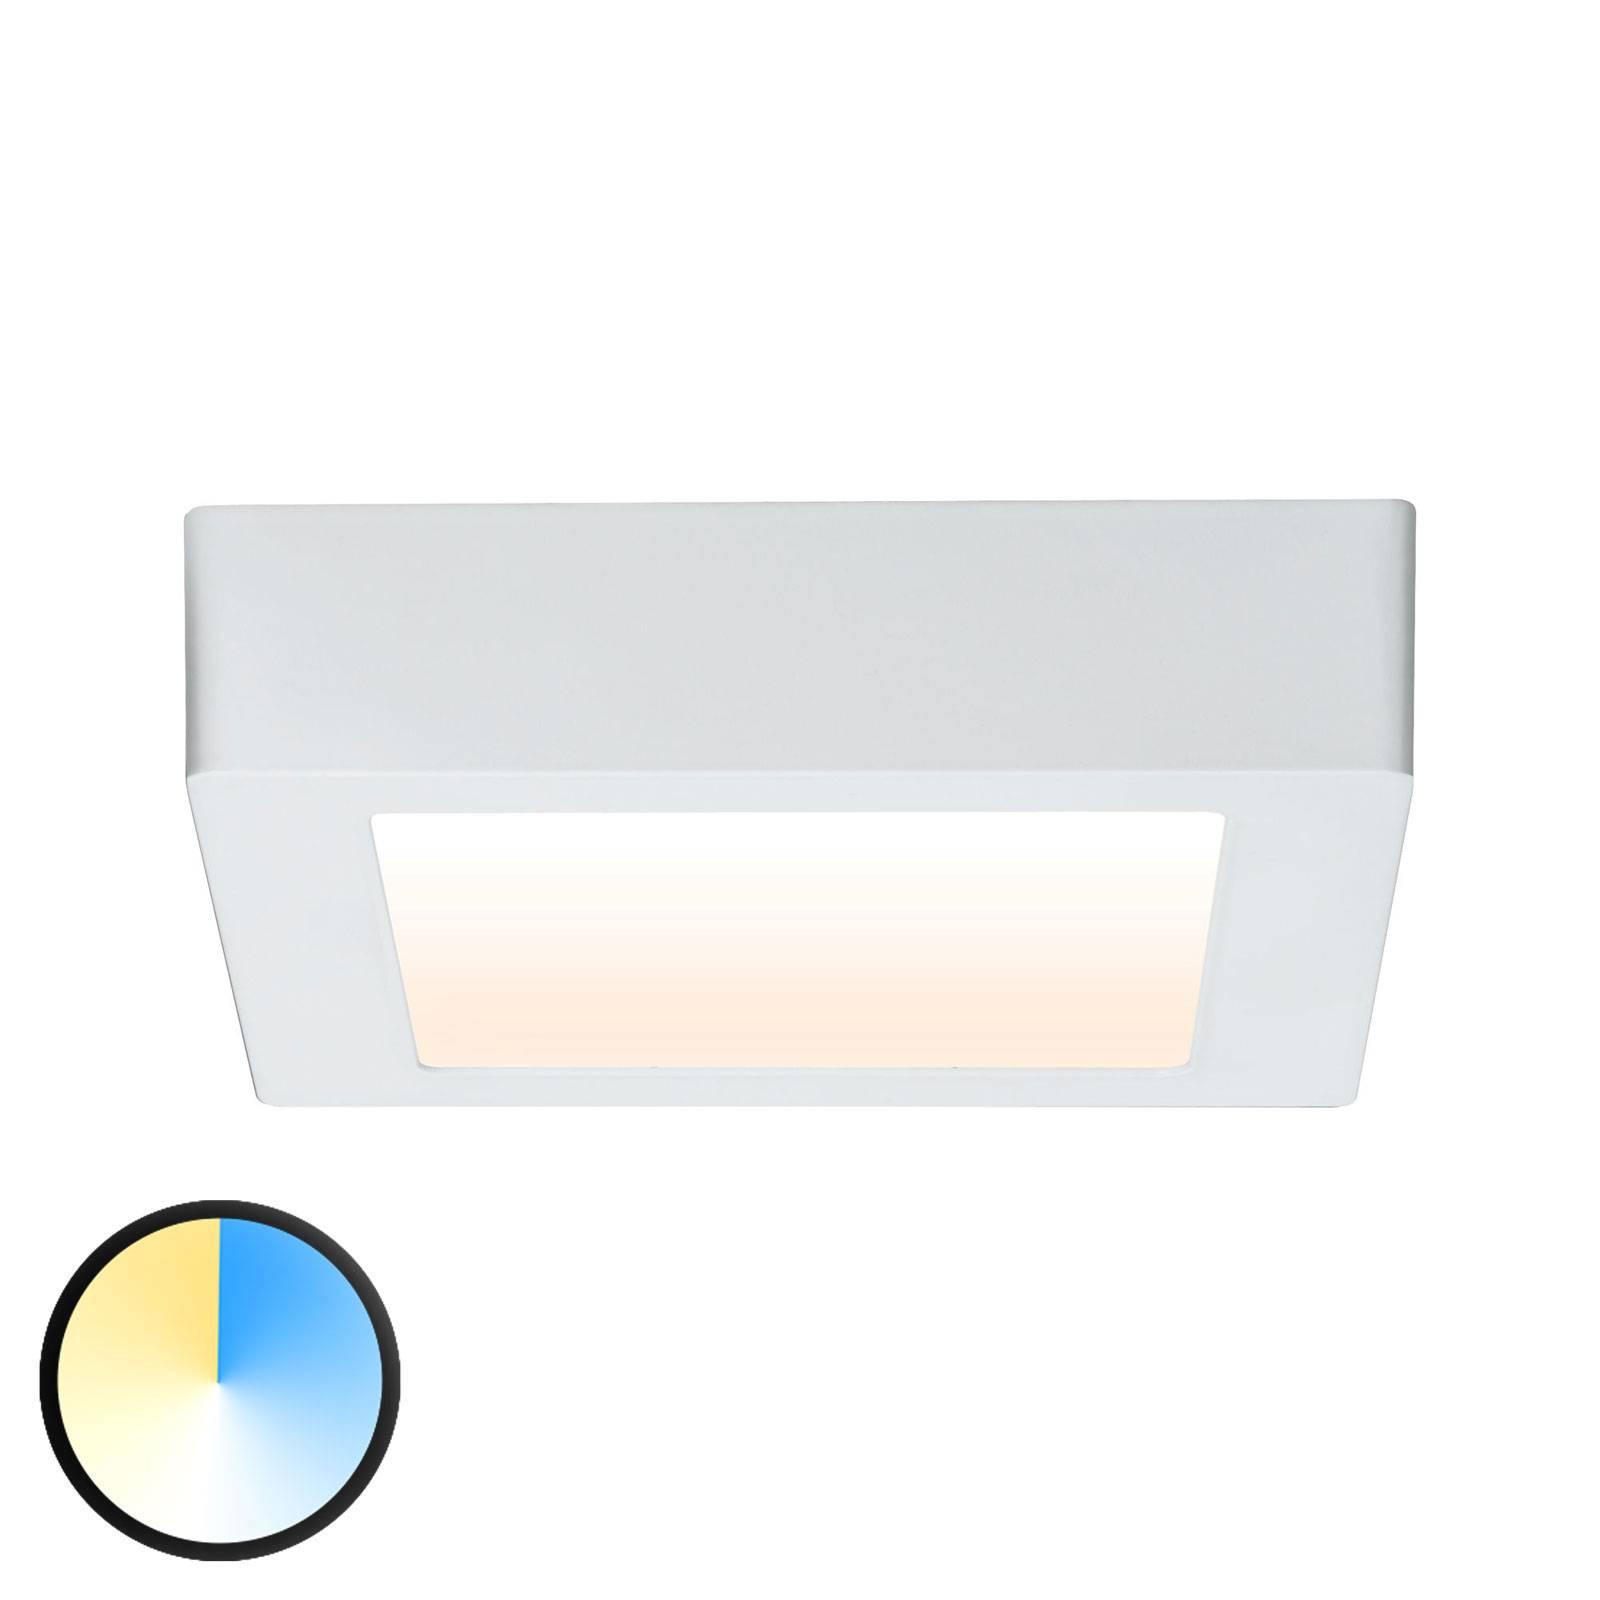 Paulmann Carpo -LED-kattovalaisin 17 x 17 cm